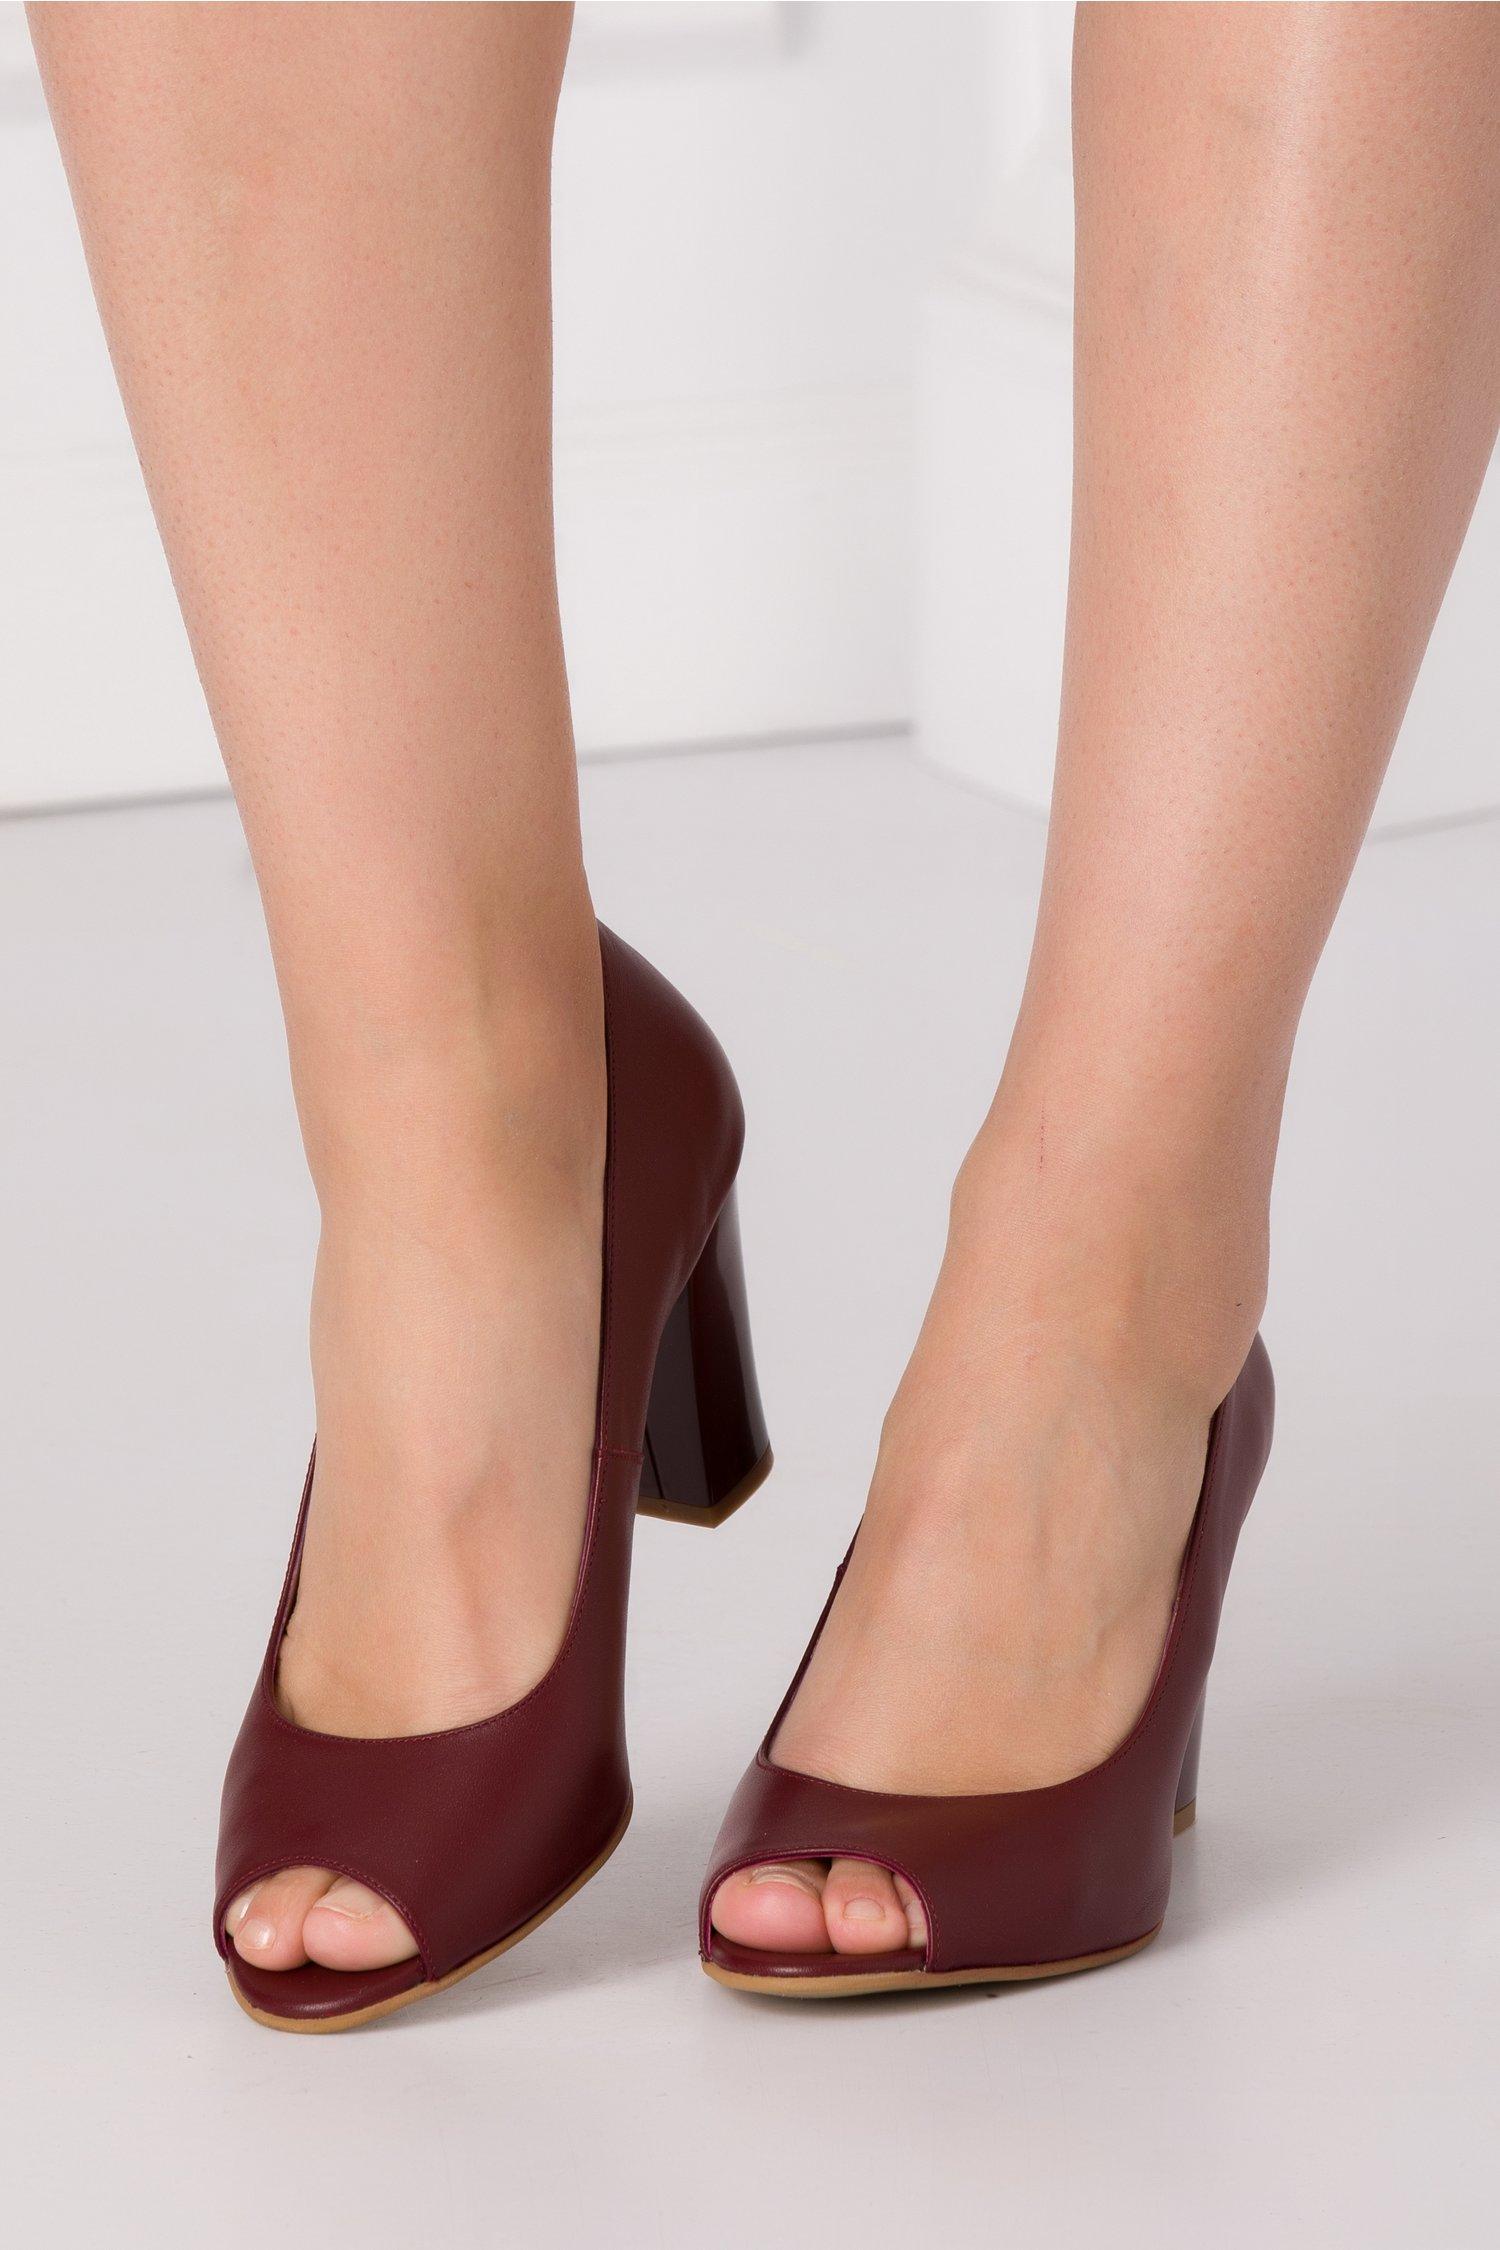 Pantofi grena decupati in fata